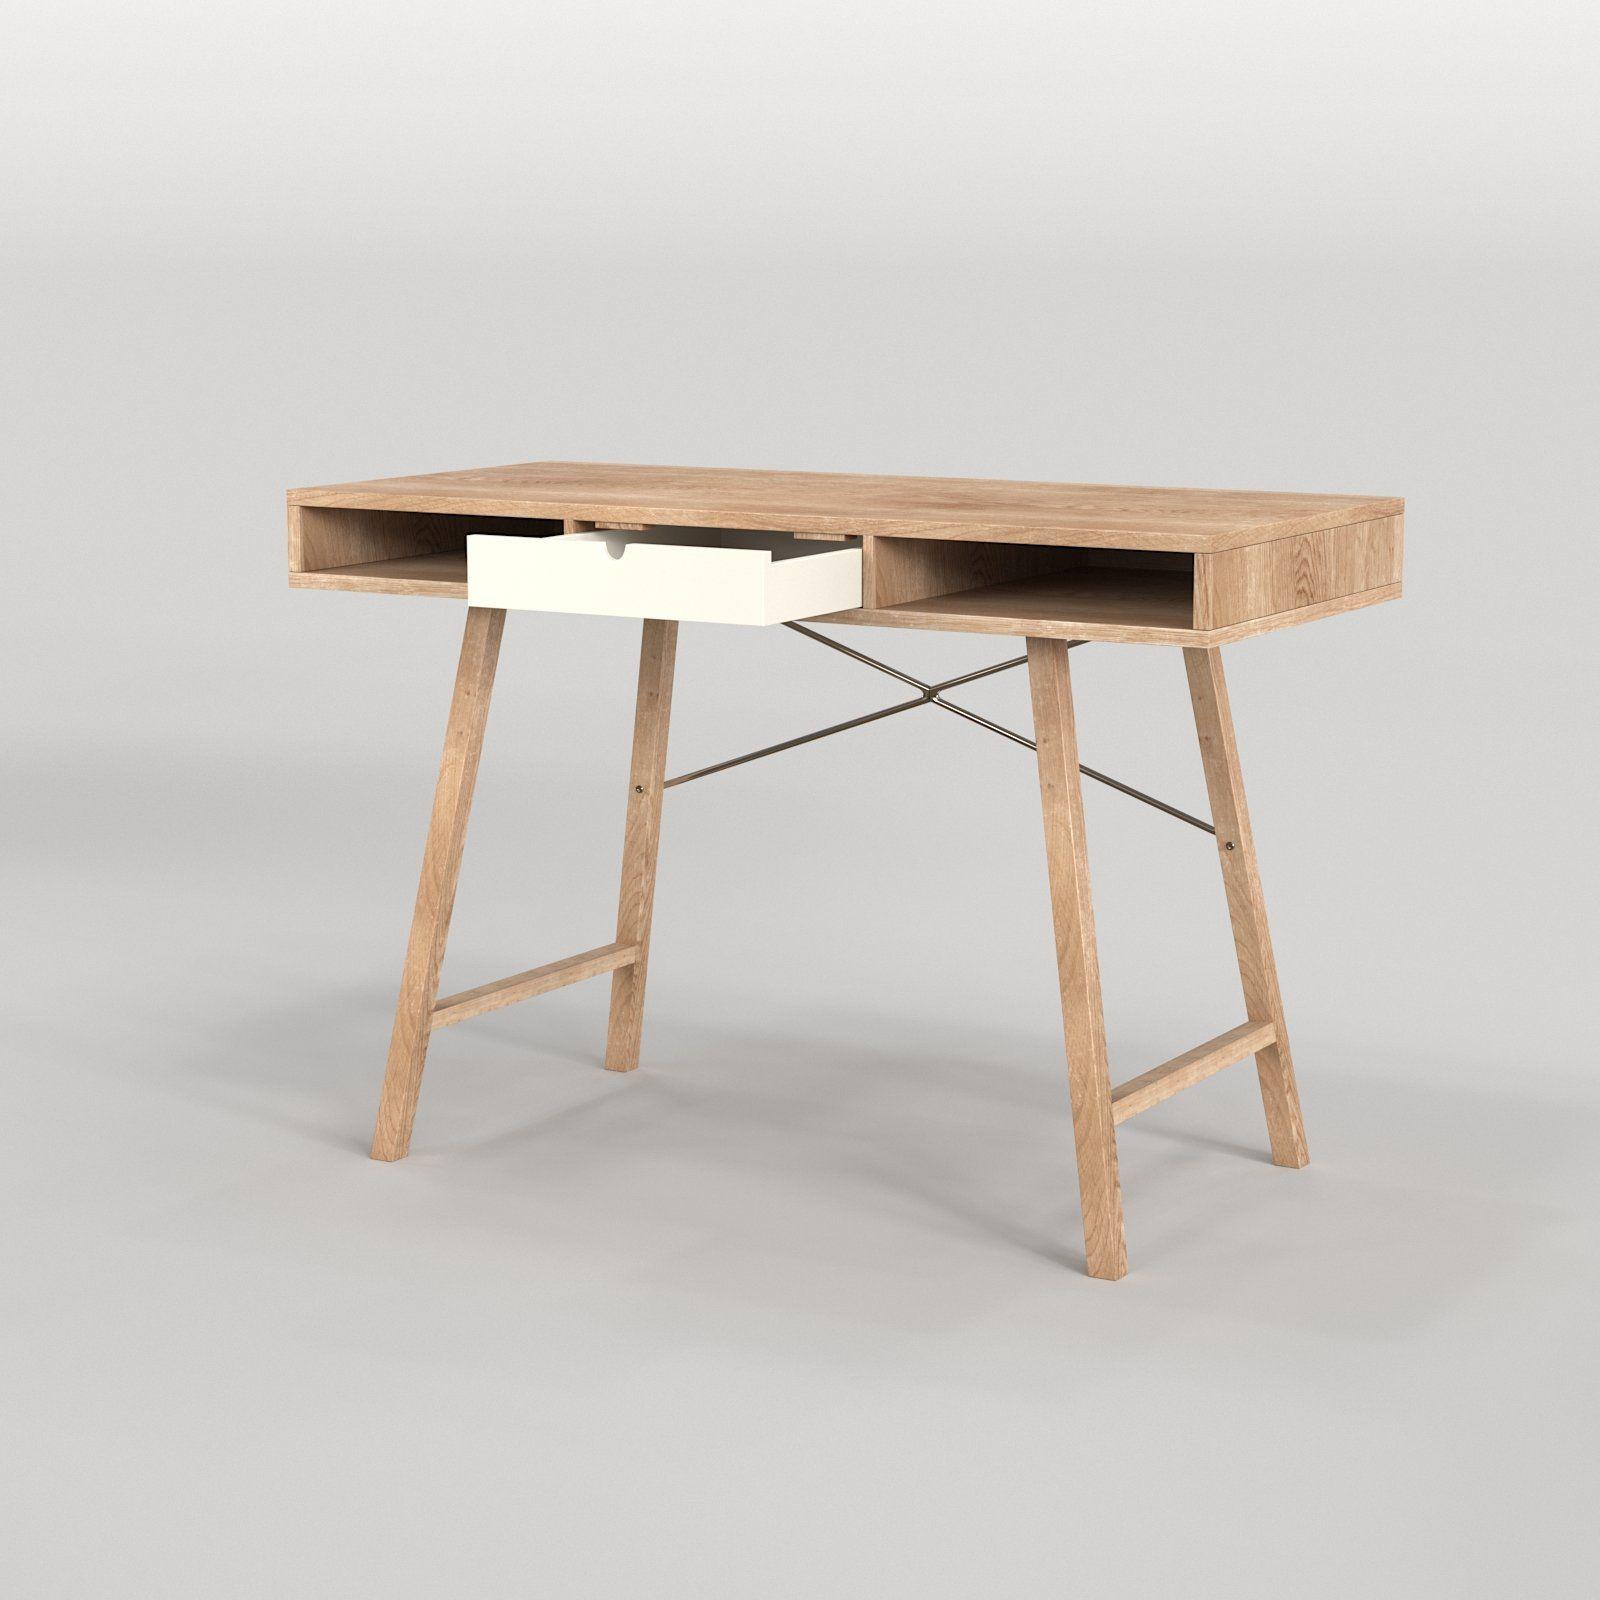 Scandinavian Desk 05 Scandinavian Desk Scandinavian Booth Design